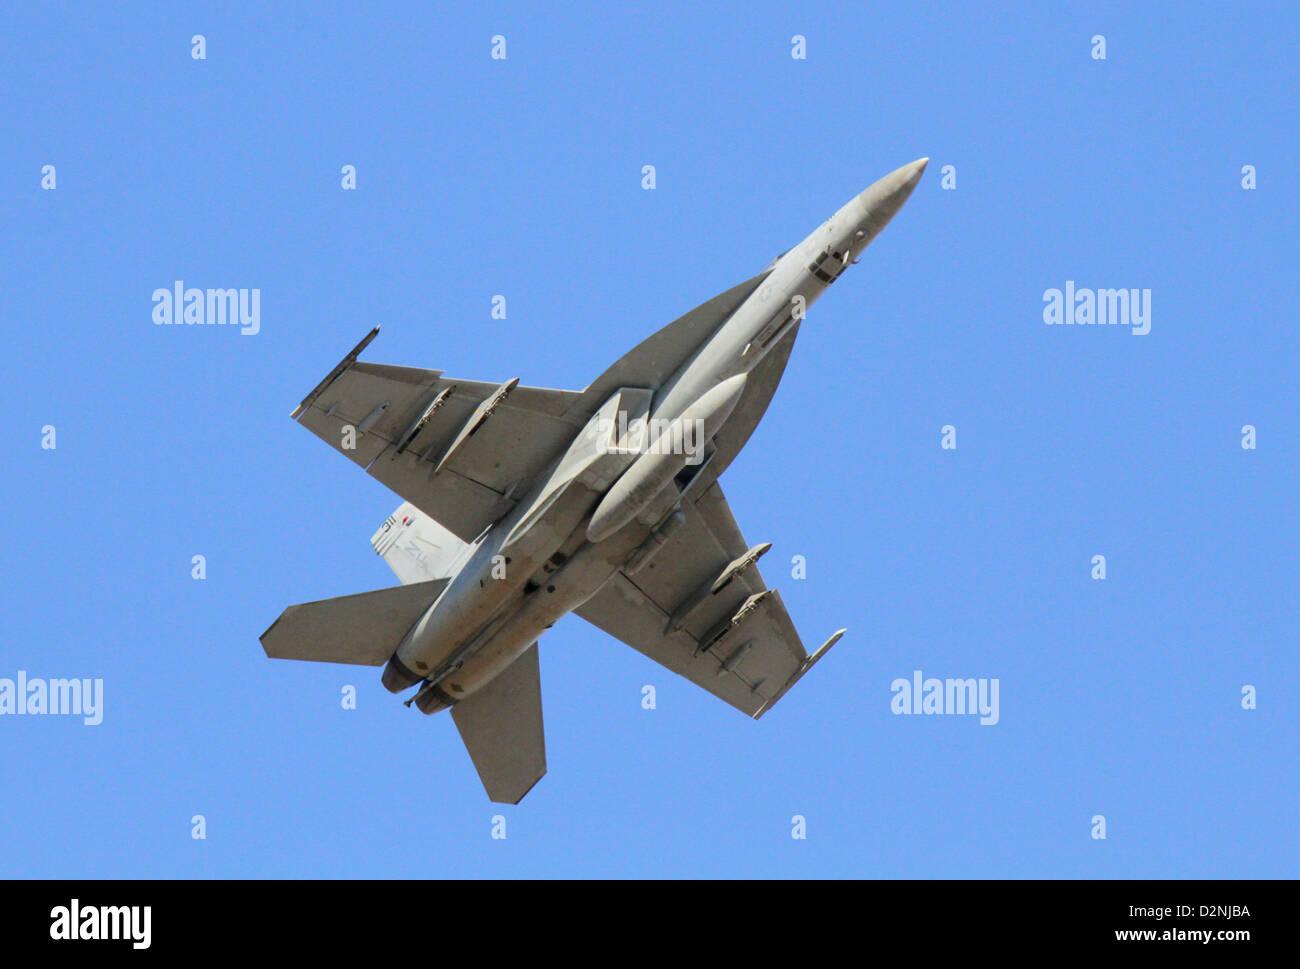 Boeing F/A-18E/F Super Hornet multirole fighter aircraft - Stock Image